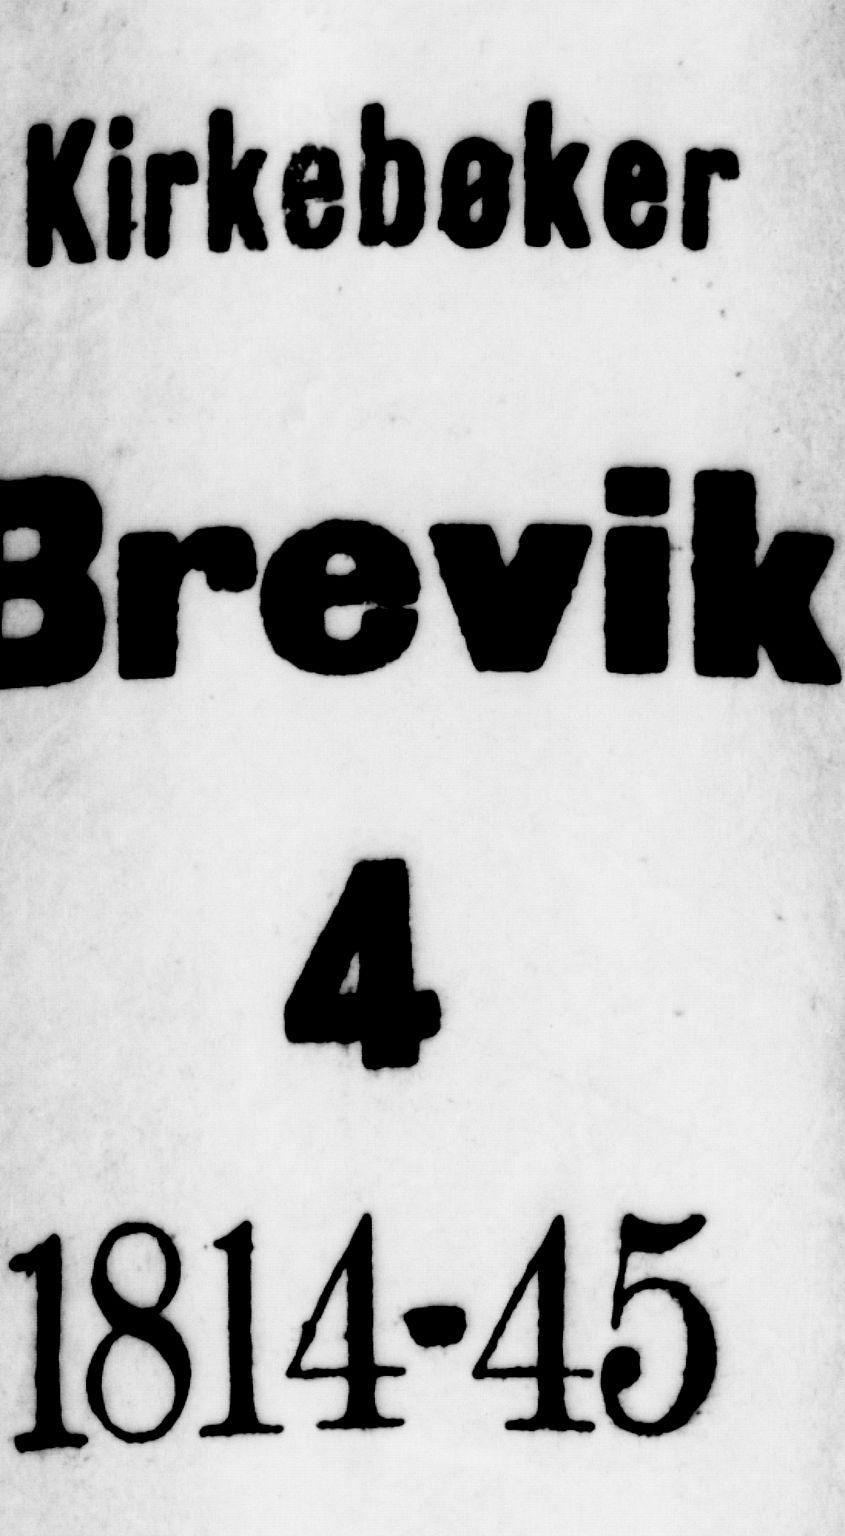 SAKO, Brevik kirkebøker, G/Ga/L0001: Klokkerbok nr. 1, 1814-1845